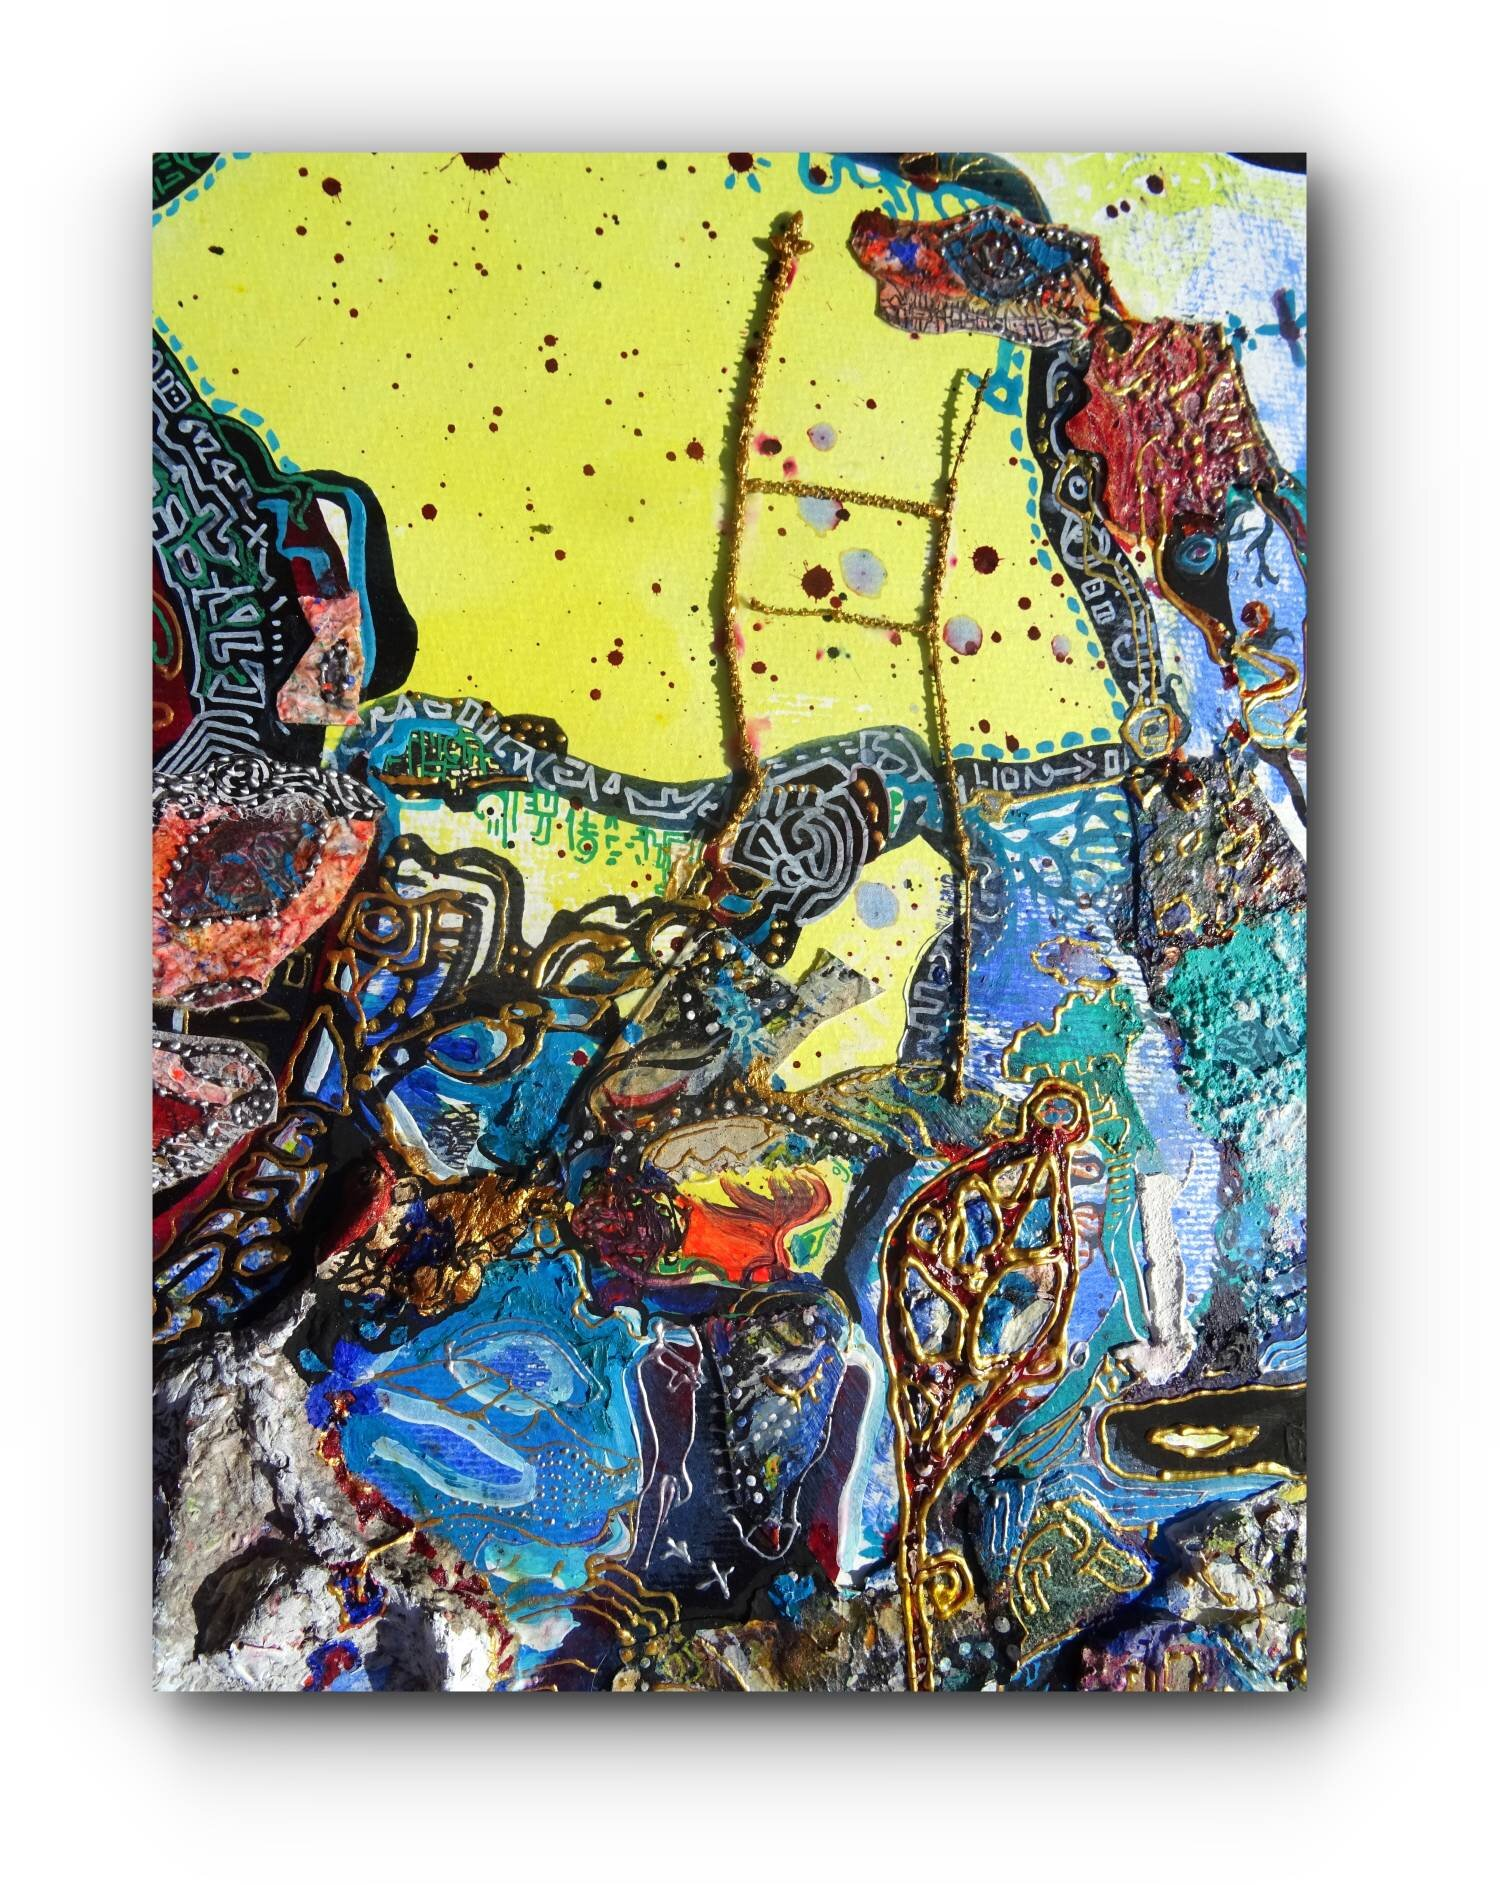 painting-celestial-summit-d1-artist-duo-ingress-vortices.jpg